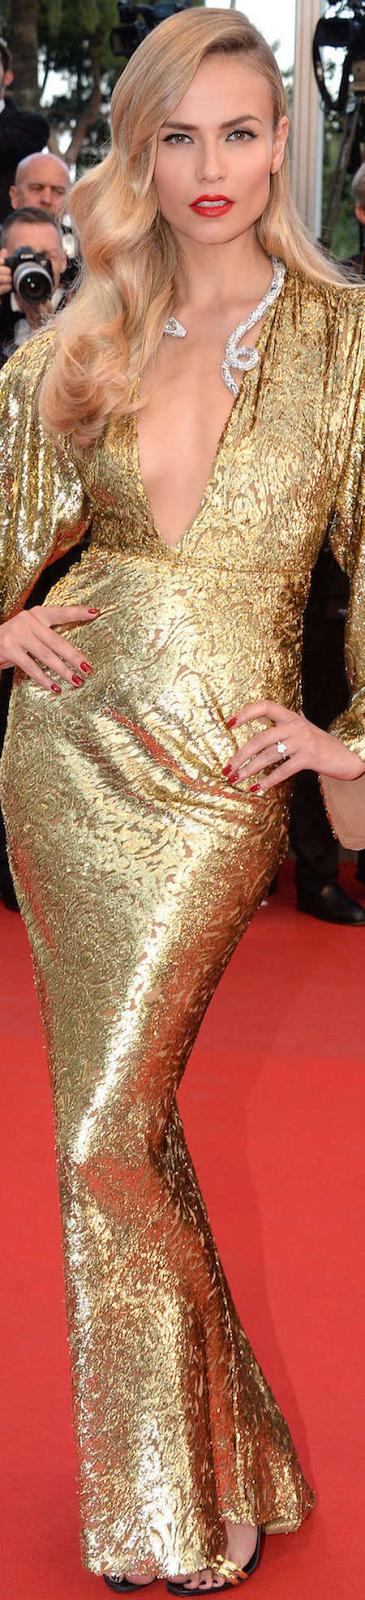 Natasha Poly 2015 Cannes Flim Festival